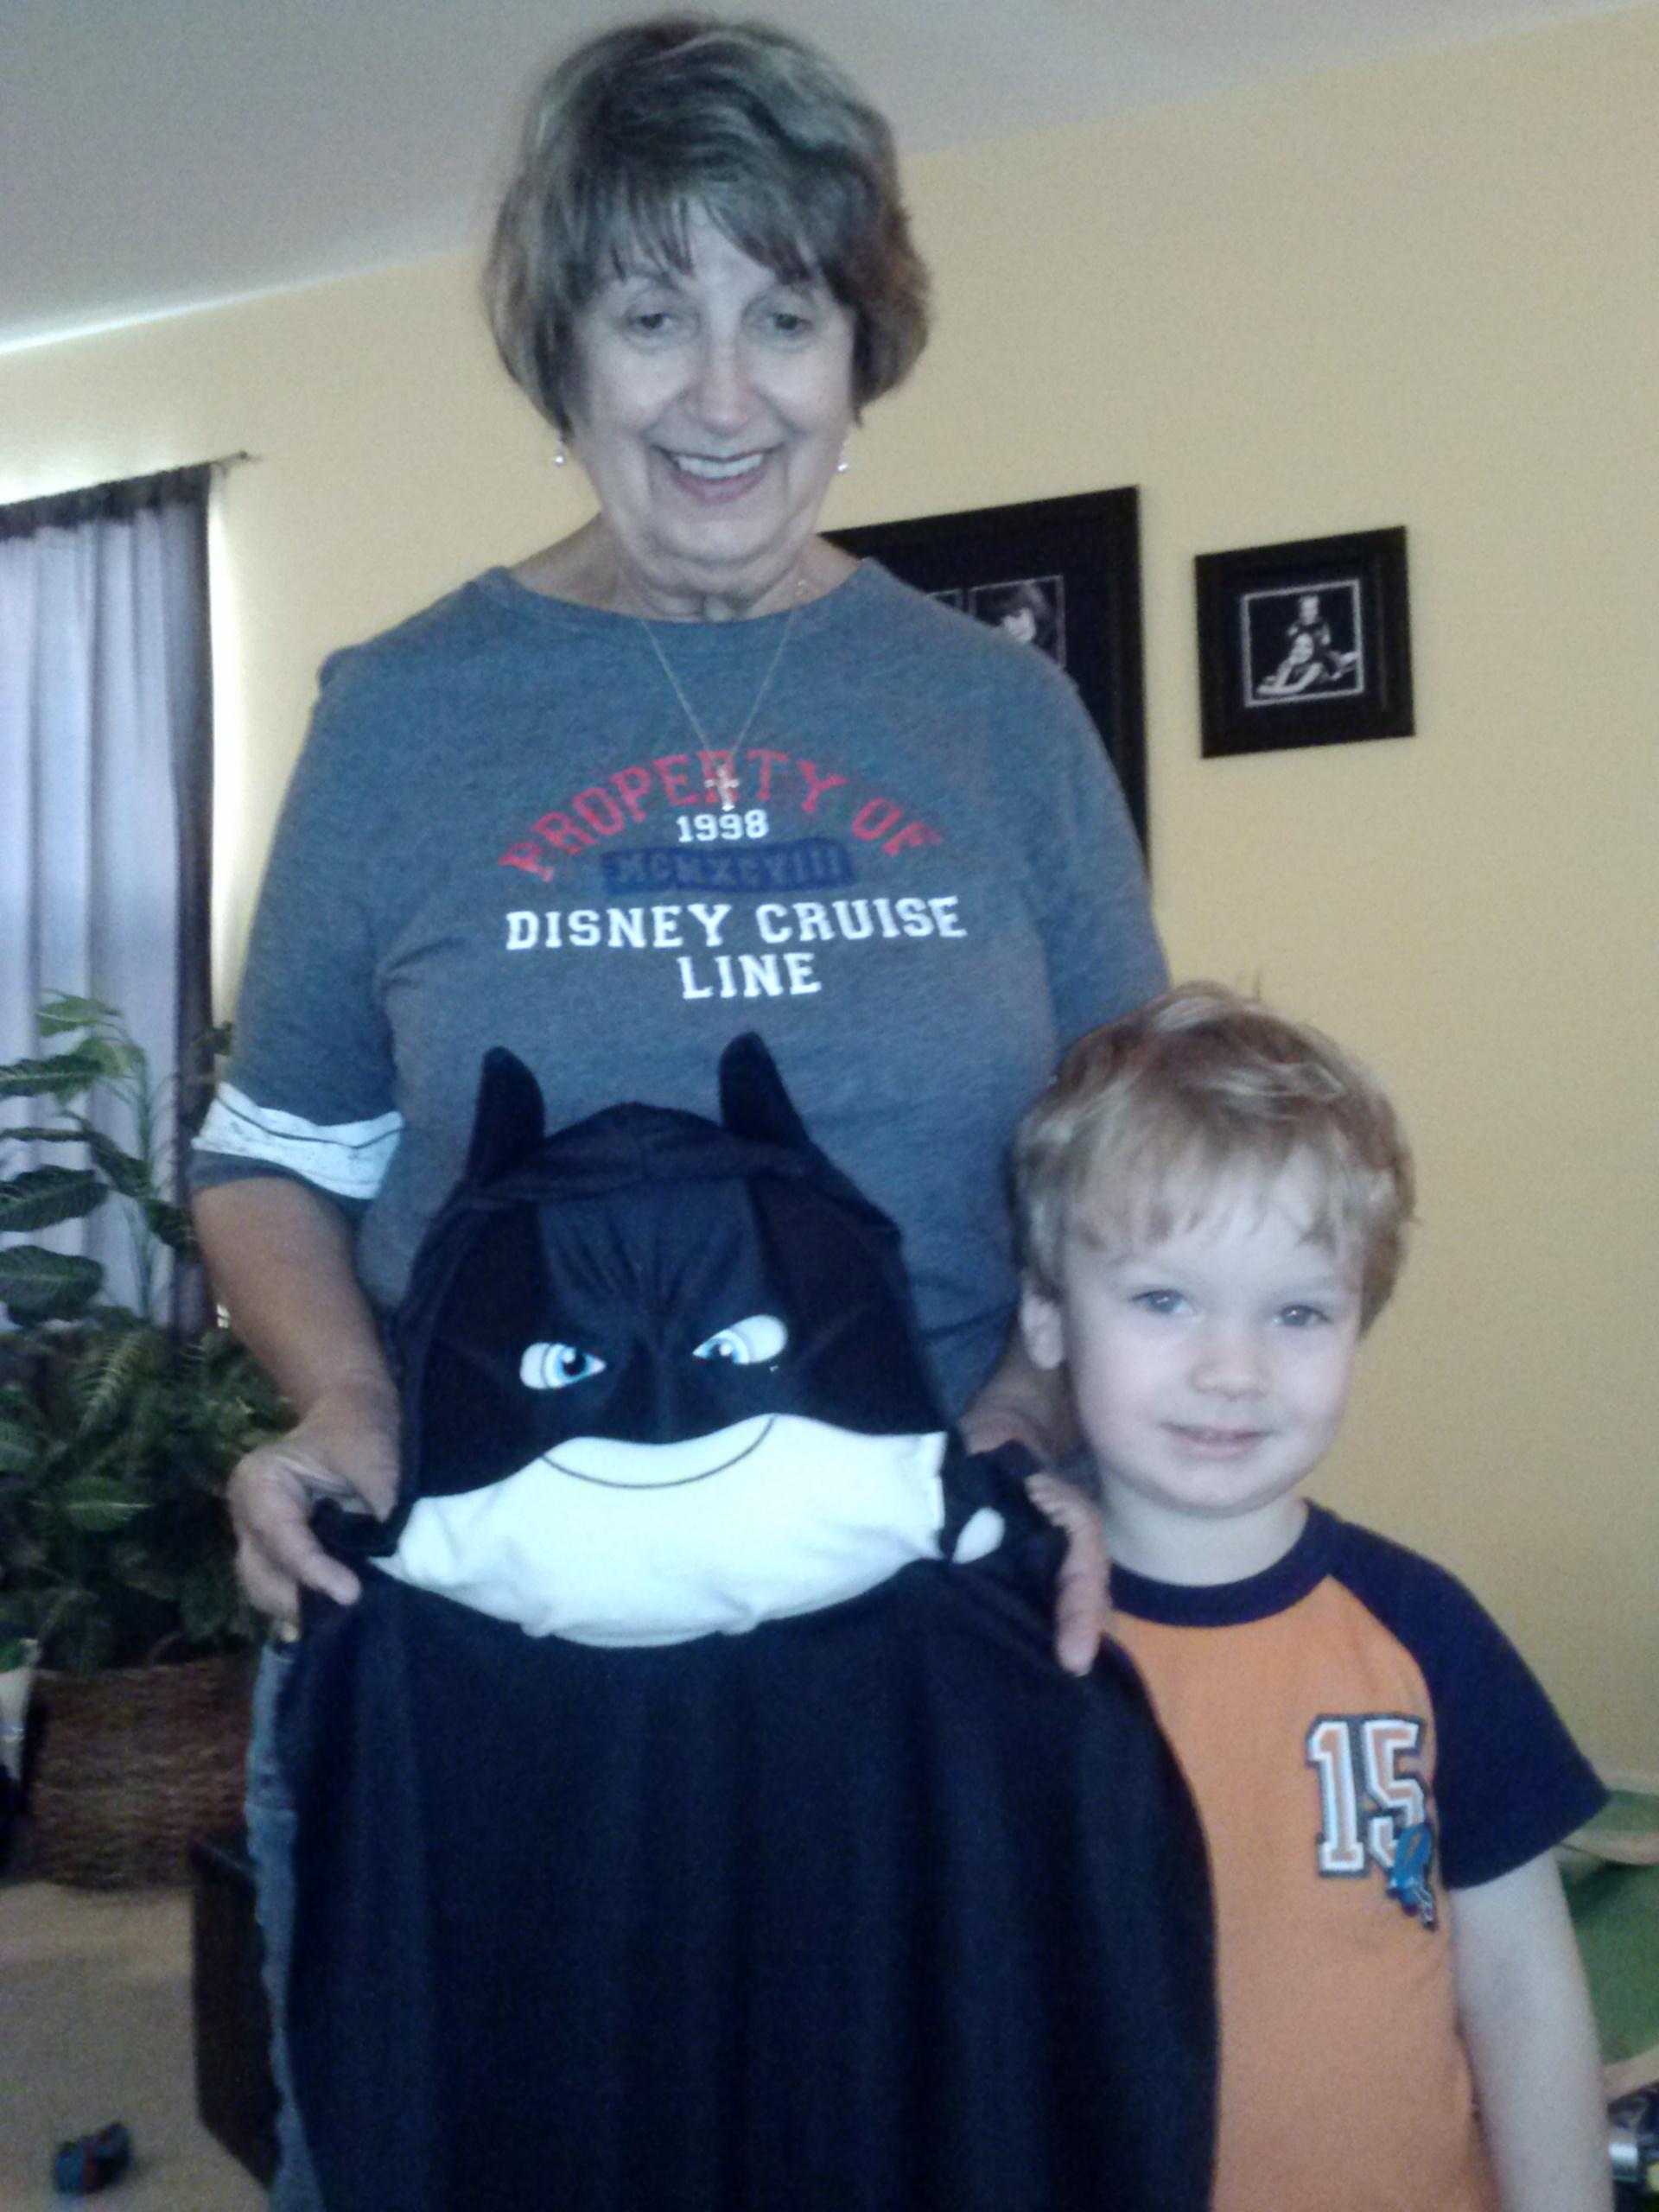 Playing dress up as Batman!